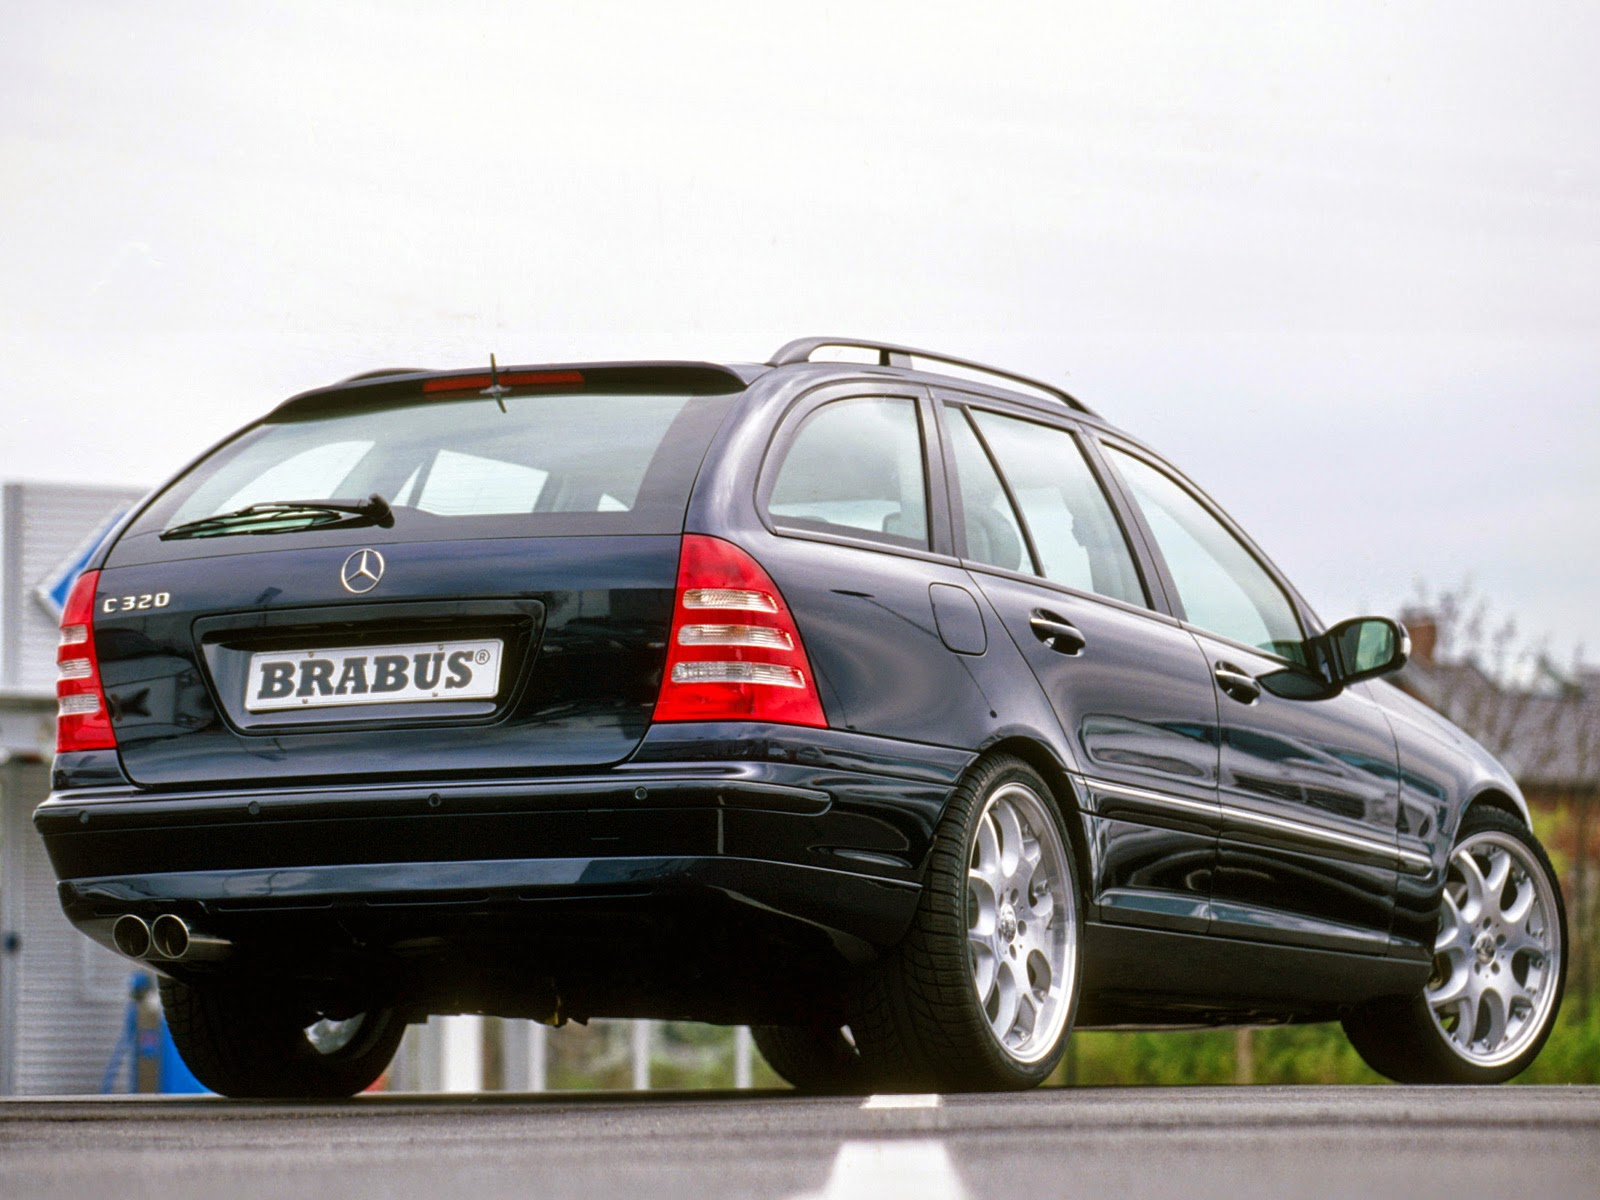 G Wagon 6X6 >> Mercedes-Benz C320 S203 BRABUS | BENZTUNING